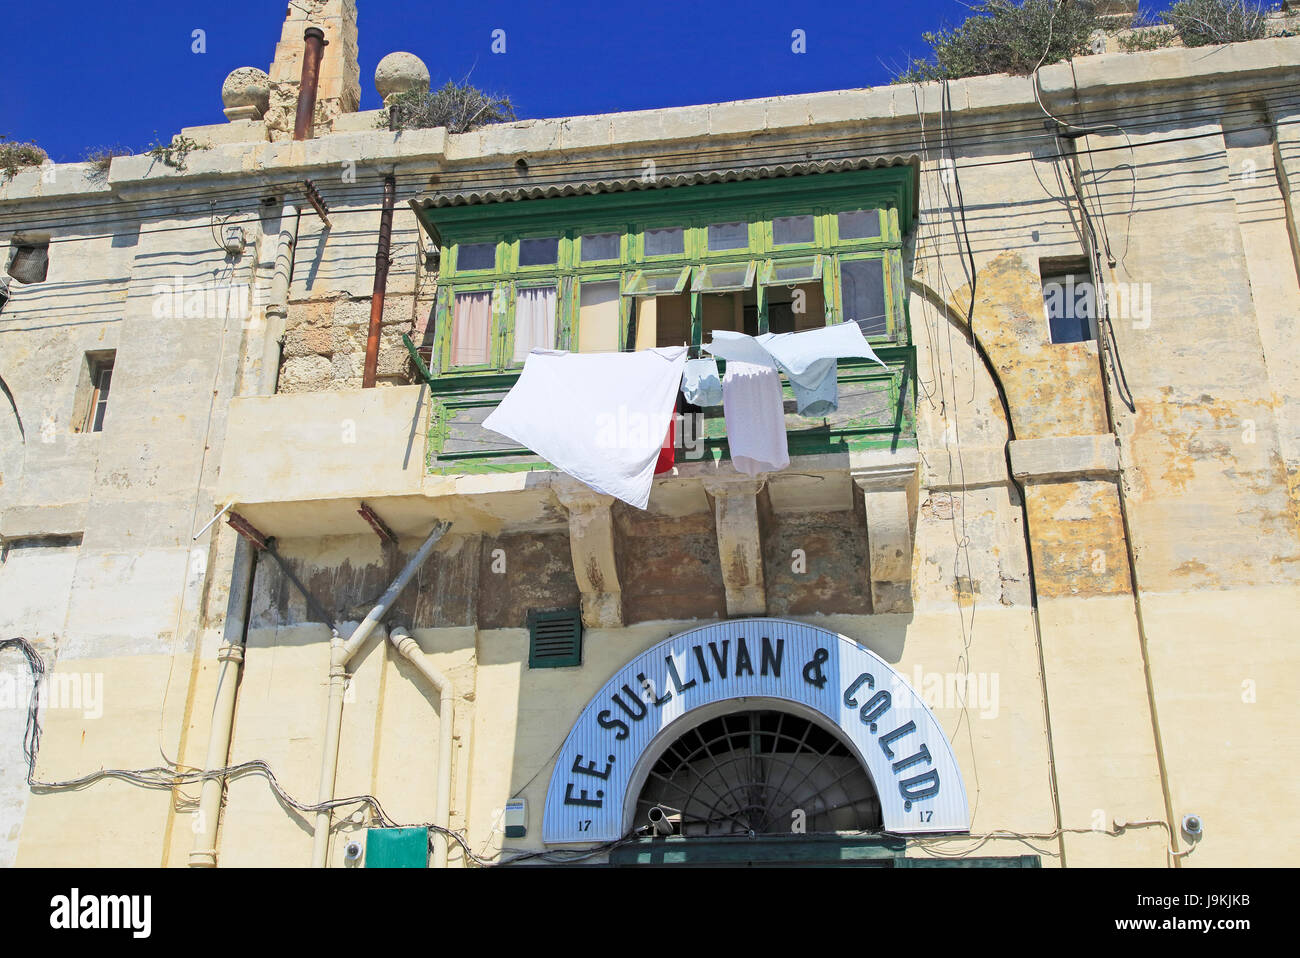 Old merchant house with balcony about warehouse area, Valletta, Malta F E Sullivan ship supply business premises - Stock Image